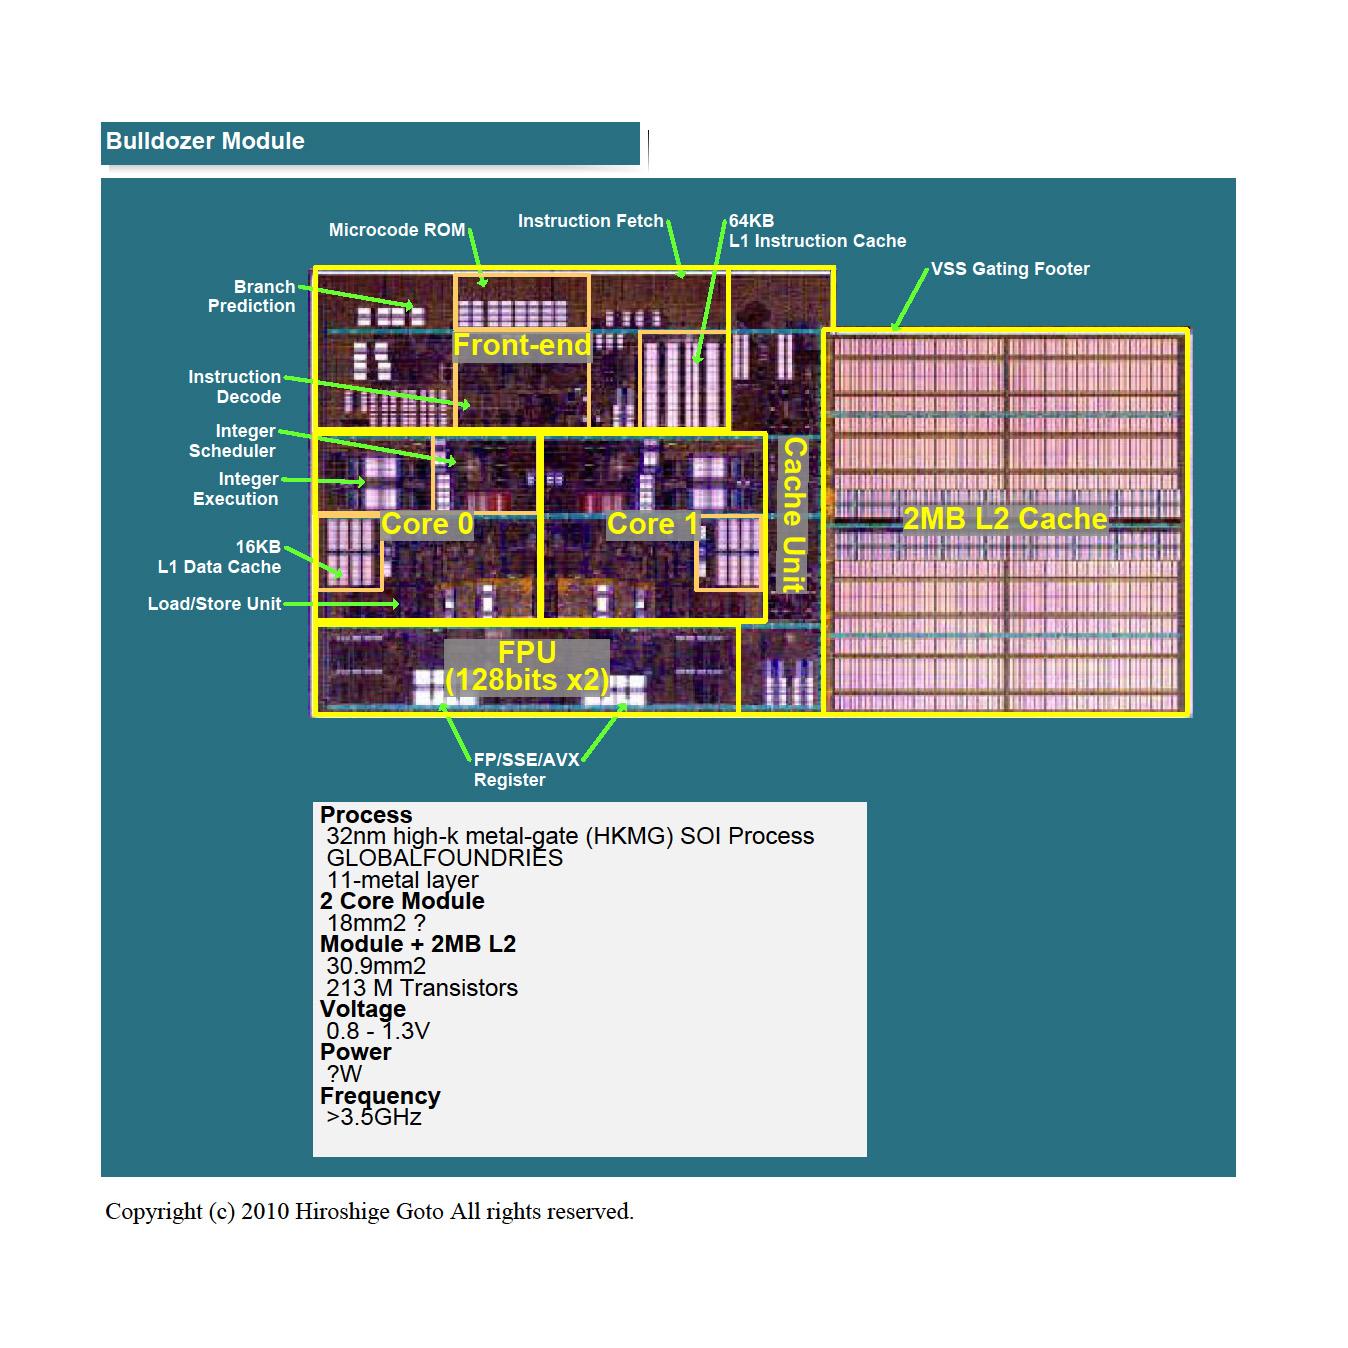 "Bulldozerモジュールの概要<br>PDF版は<a href=""/video/pcw/docs/473/823/p4.pdf"">こちら</a>"